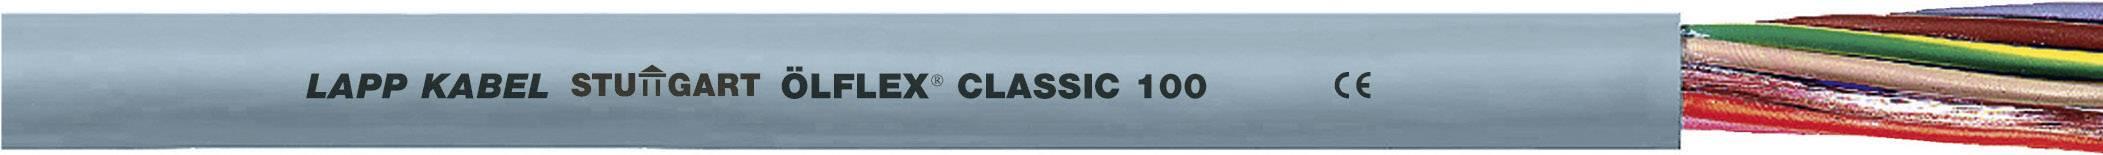 Kabel LappKabel Ölflex CLASSIC 100 5X1 (00102054), PVC, 7,1 mm, 500 V, šedá, 500 m